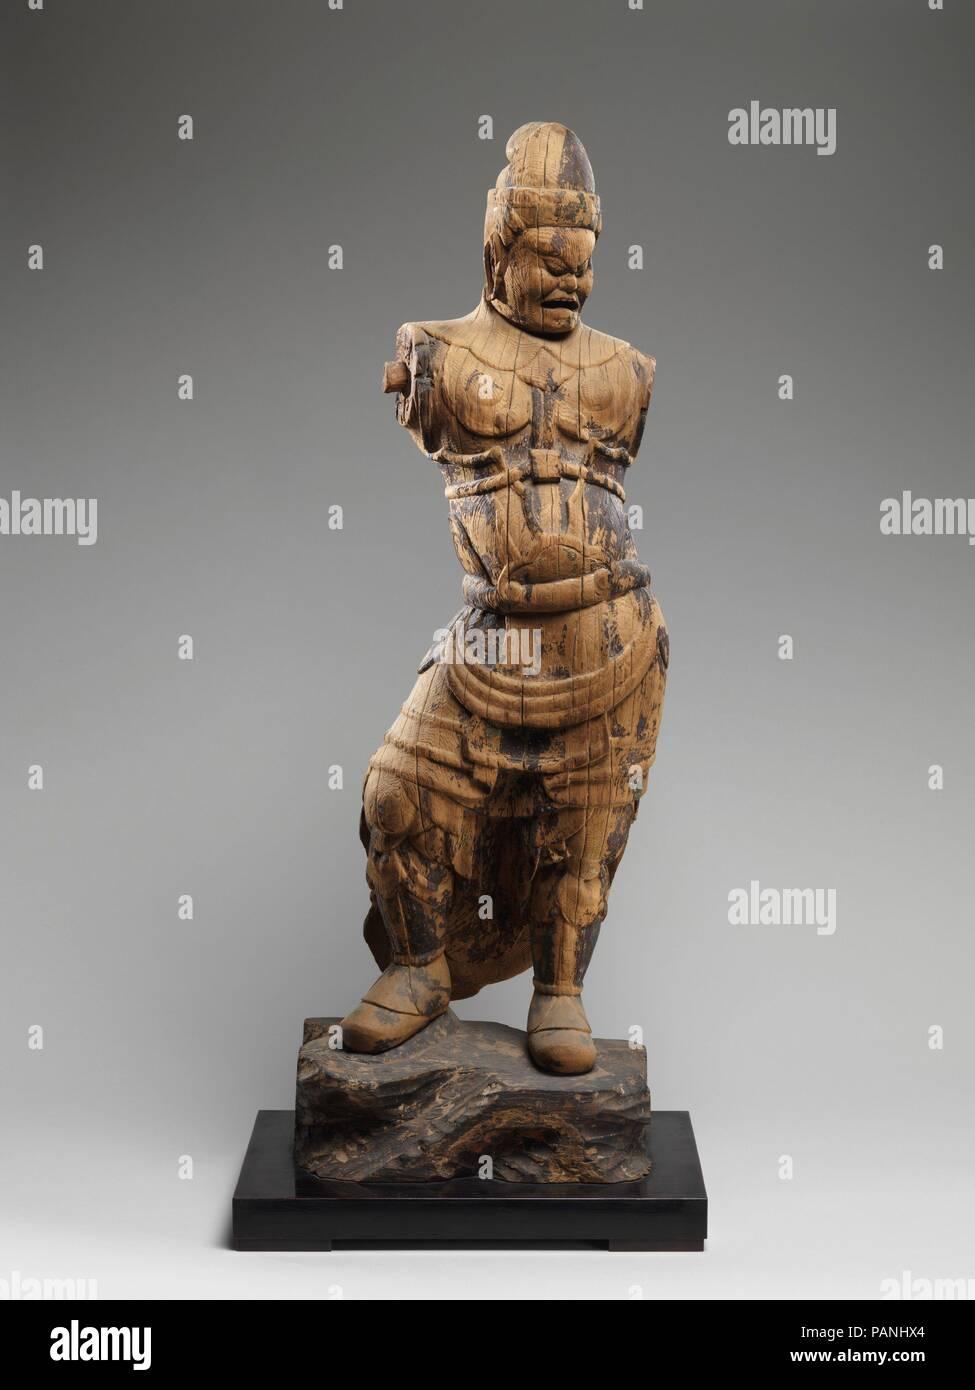 Hearty Indianische Holzfigur Handgeschnitzt Art Original Aus Kolumbien